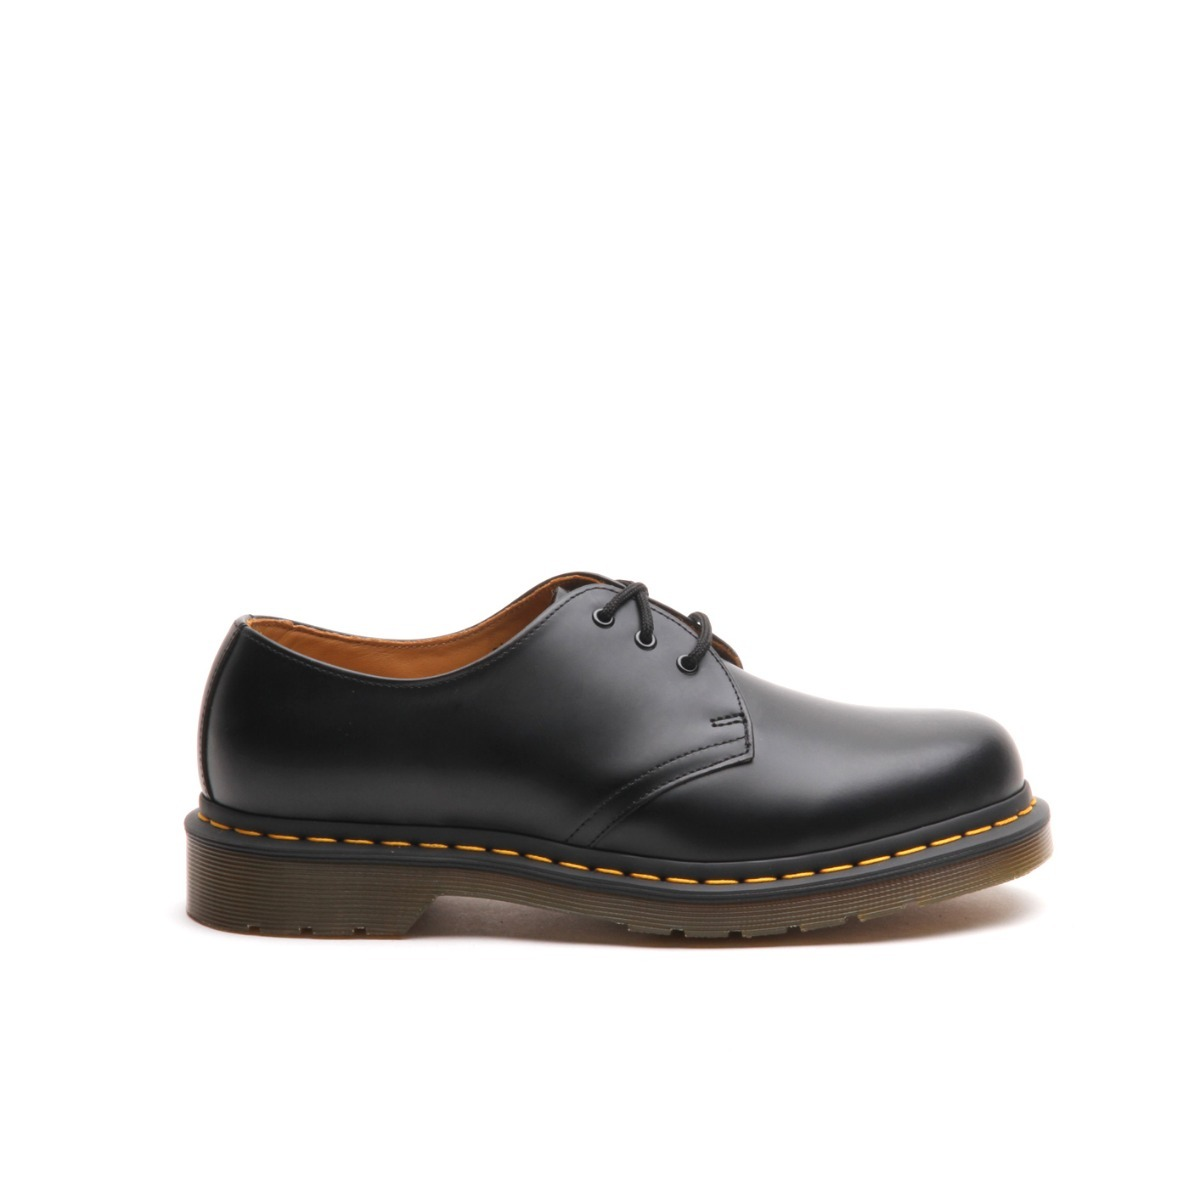 b152f38d6a791 dr martens 1461 - zapato hombre original. Cargando zoom.